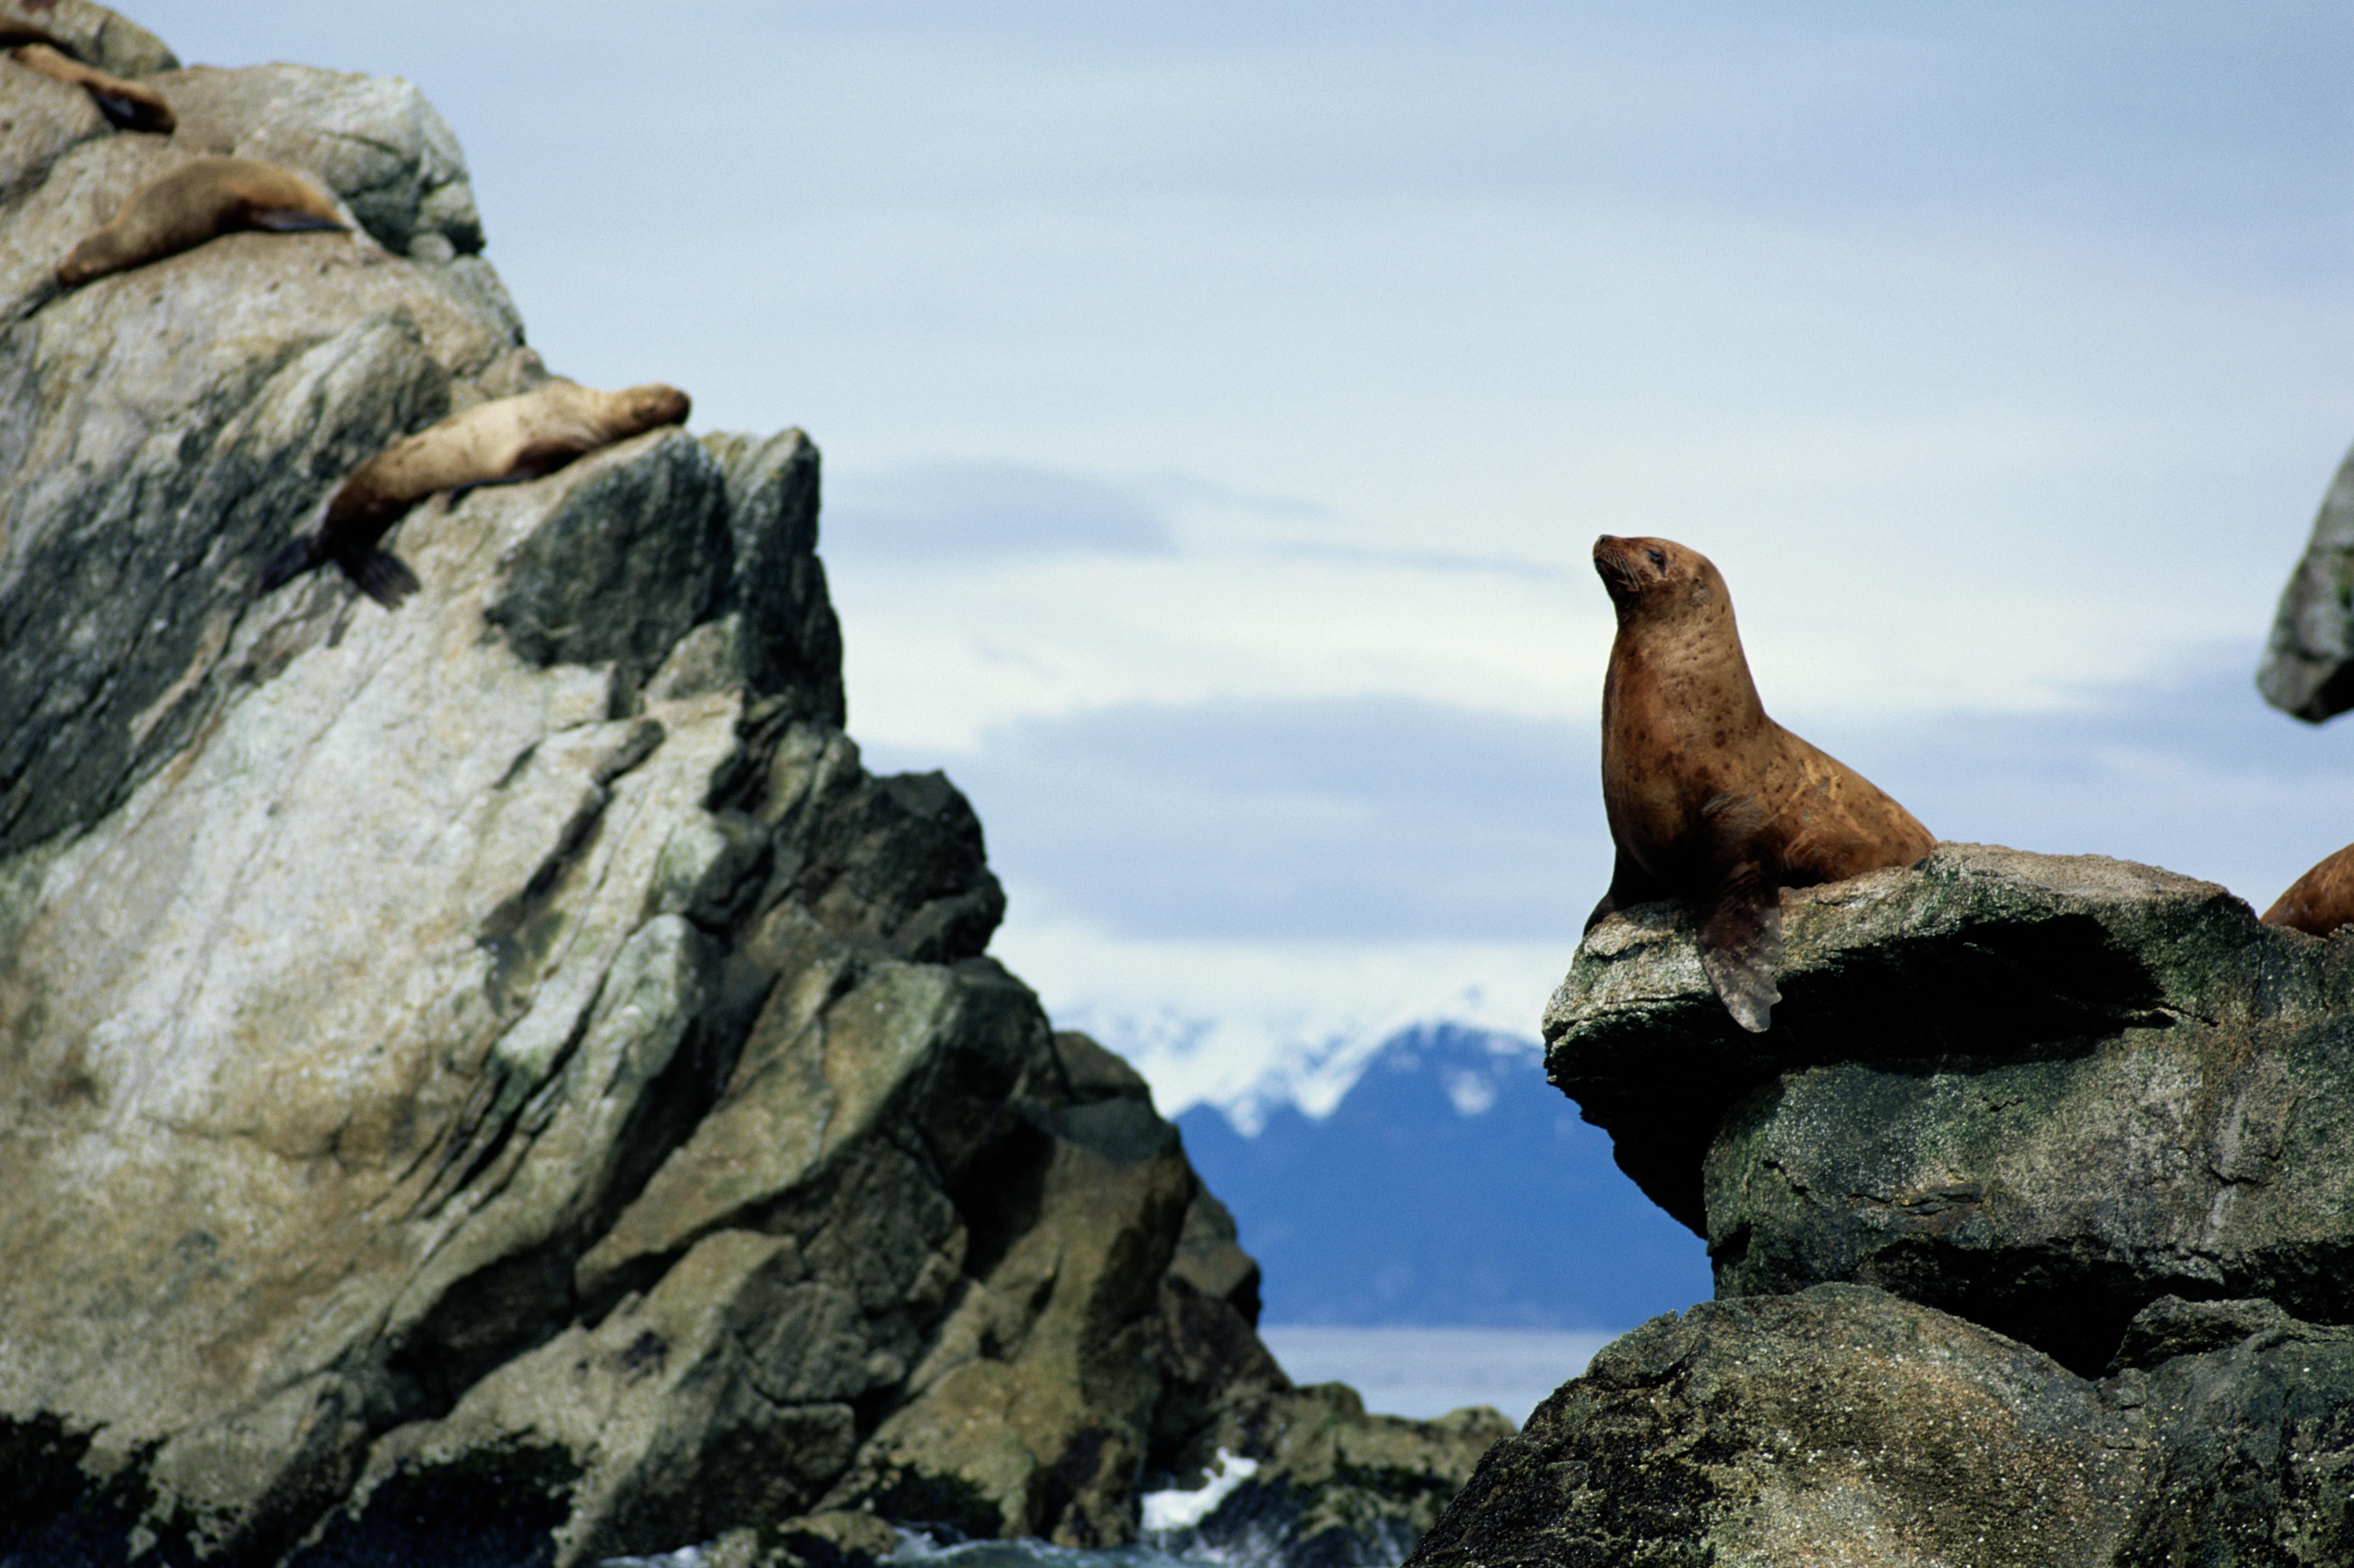 Steller's sea Lion (Eumetopiasjubatus) preparing to dive, Kenai Fjords